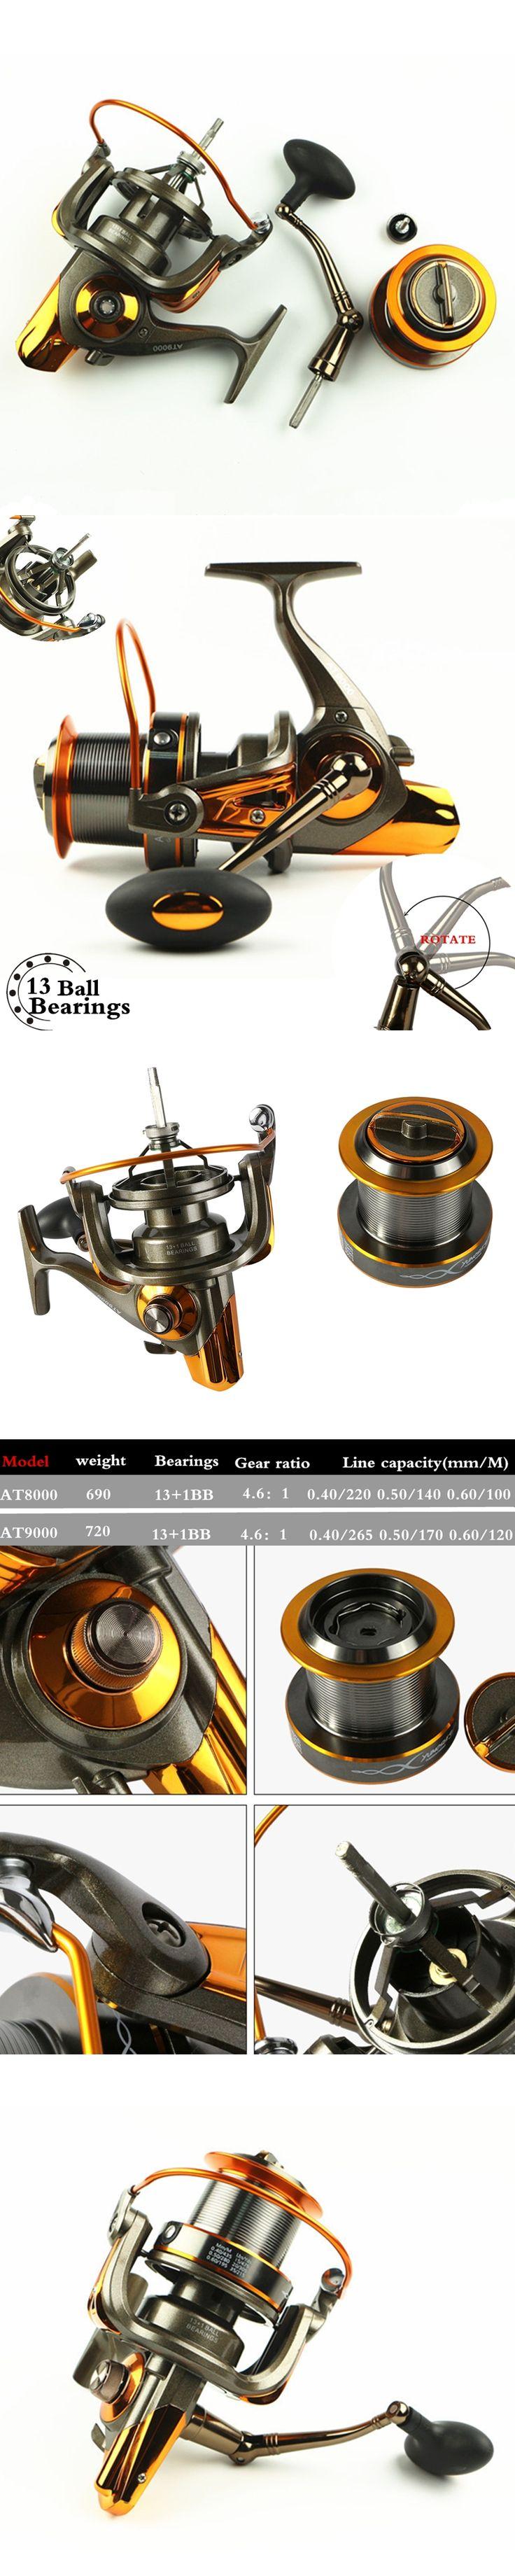 Full Metal Body Daiwa alike size 8000/9000 Long Shot casting carp Lure Fishing Reel 19KG Max Drag Sea Boat Fishing wheel